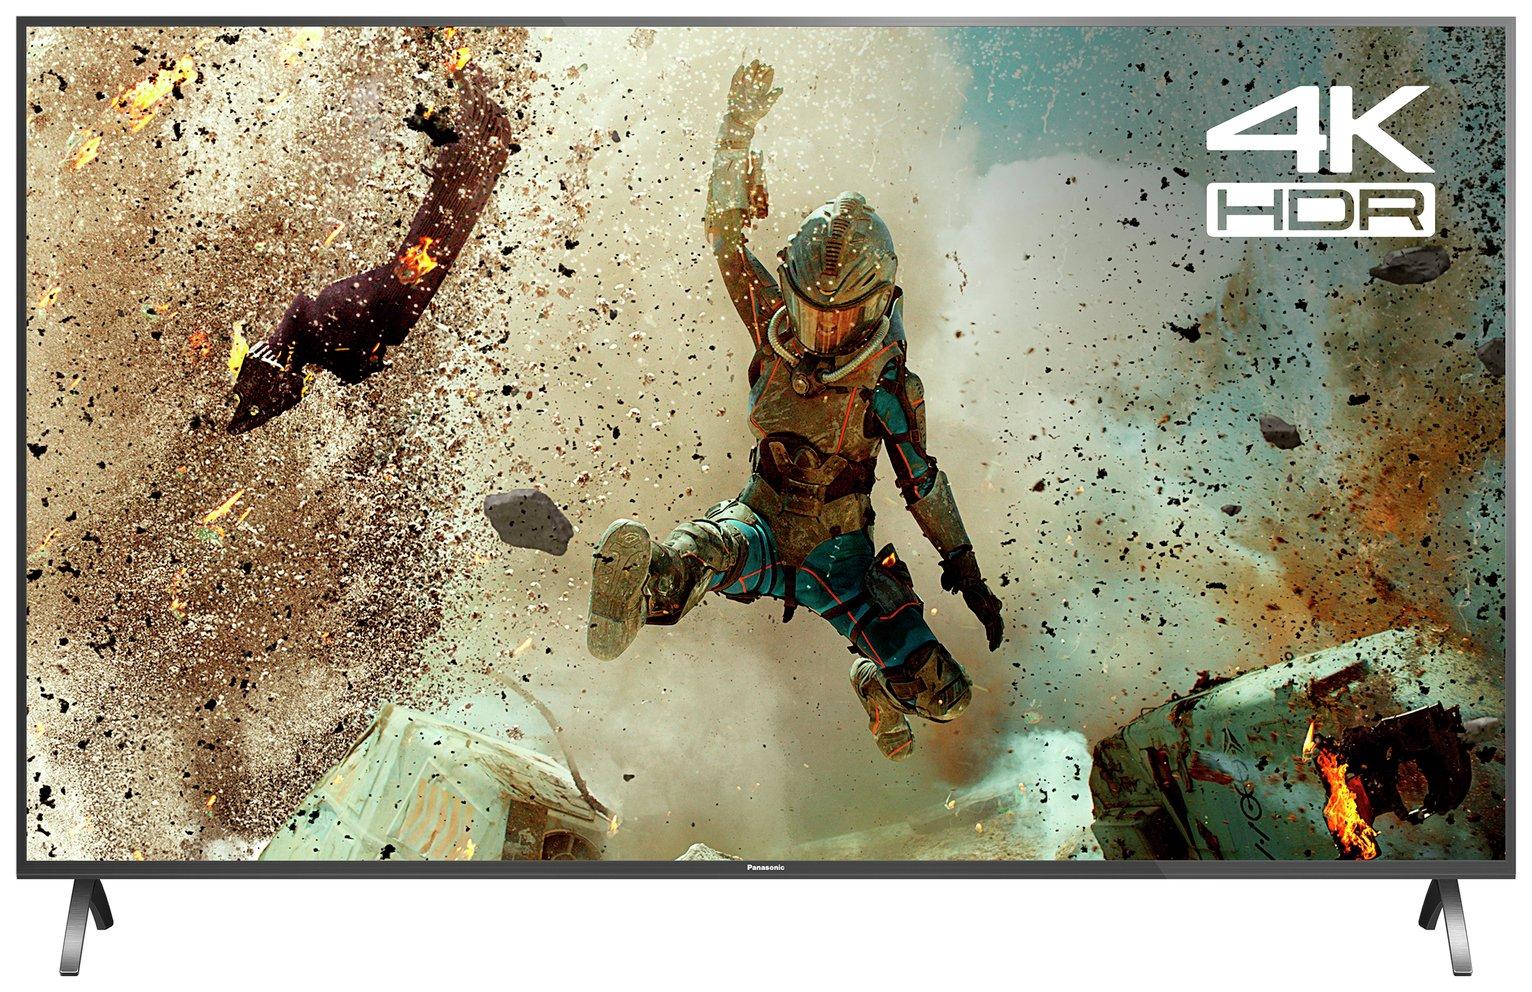 Panasonic Panasonic 55 Inch TX-55FX700B Smart 4K UHD TV with HDR